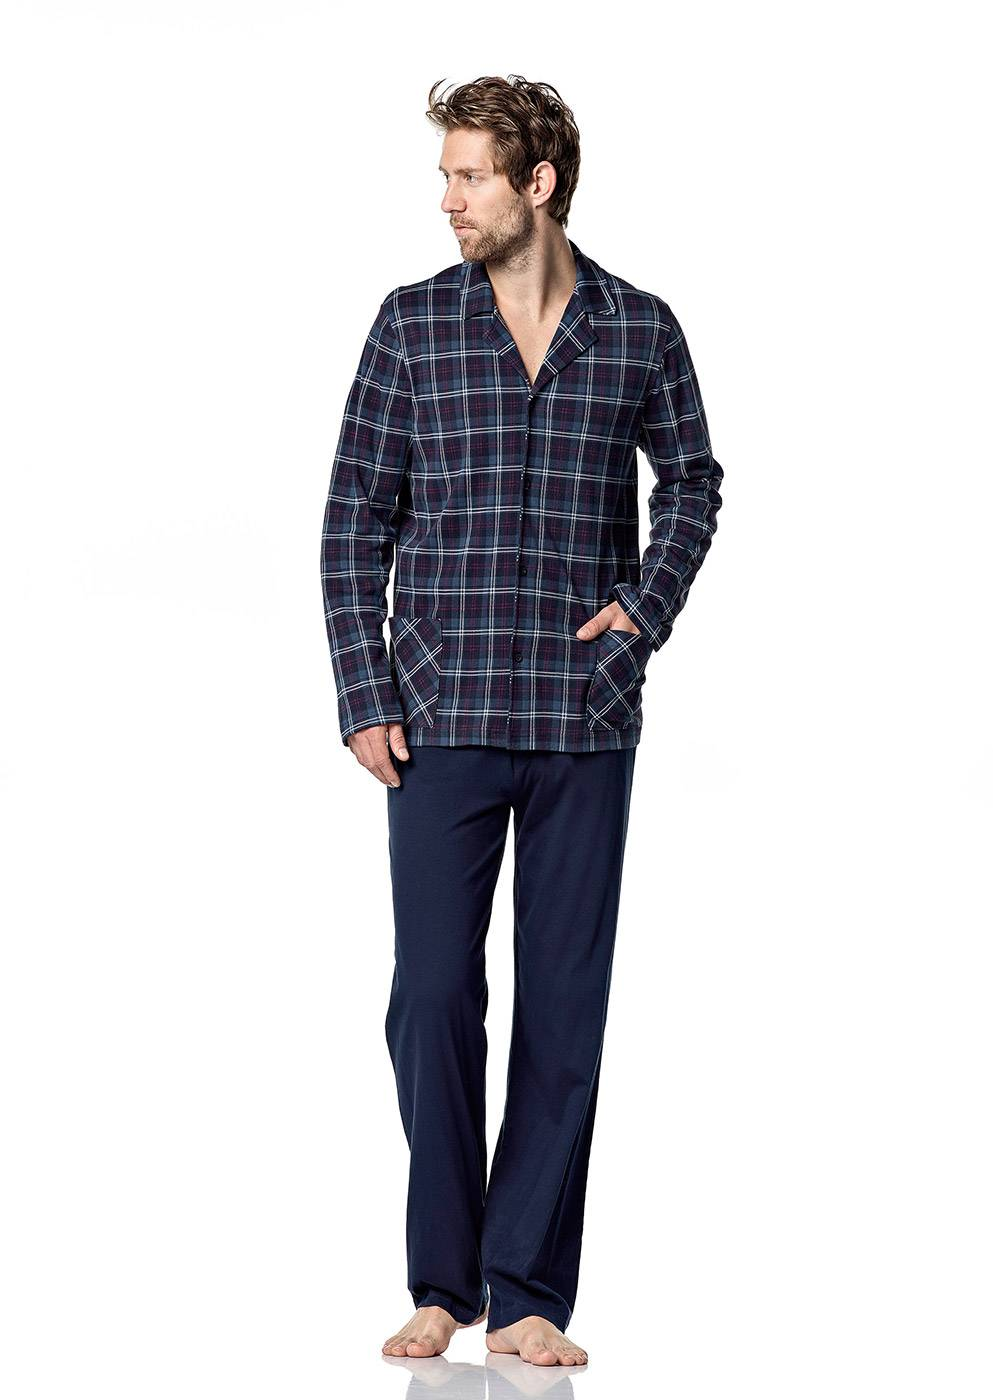 Pánské pyžamo 5041 - Vamp Barva: modrá/ káro, Velikost: XXL